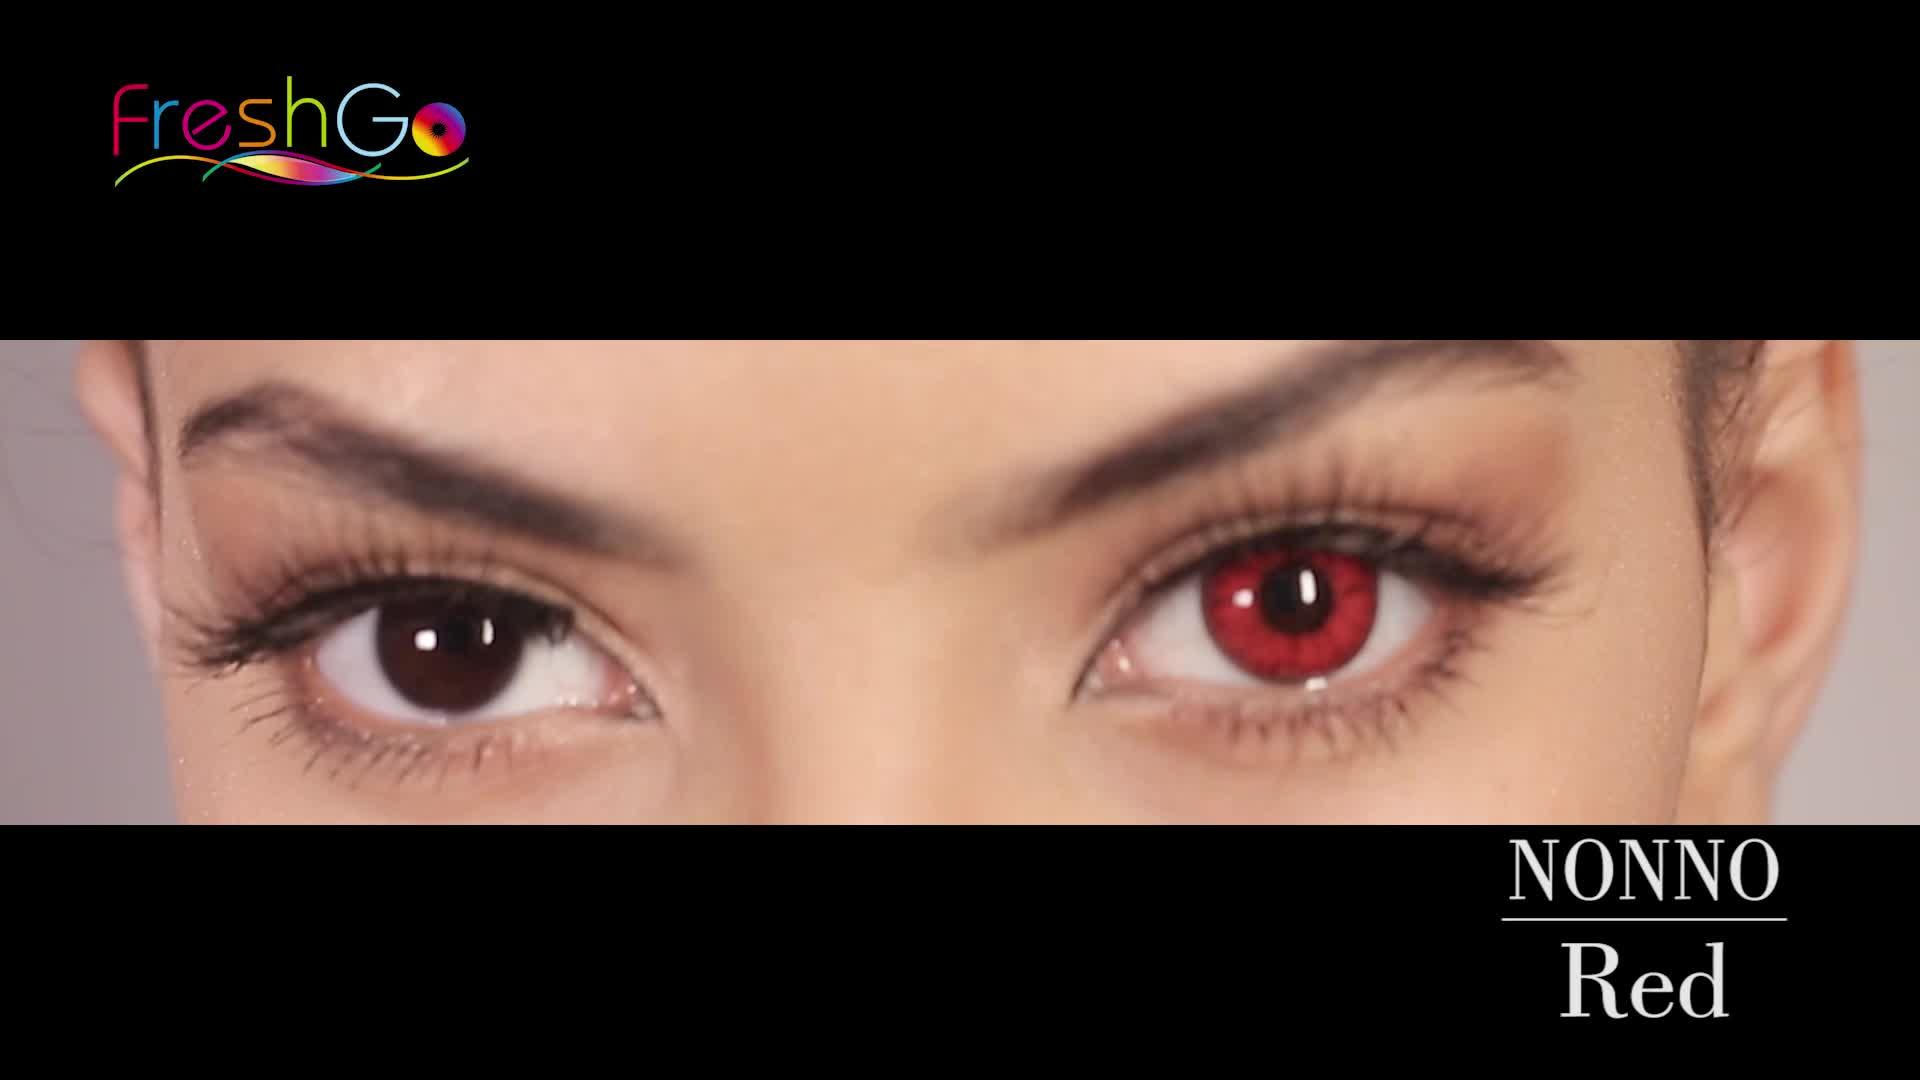 Freshgo hot sale hazel cheap green color contact lenses wholesale magic eye red cosmetic circle lens